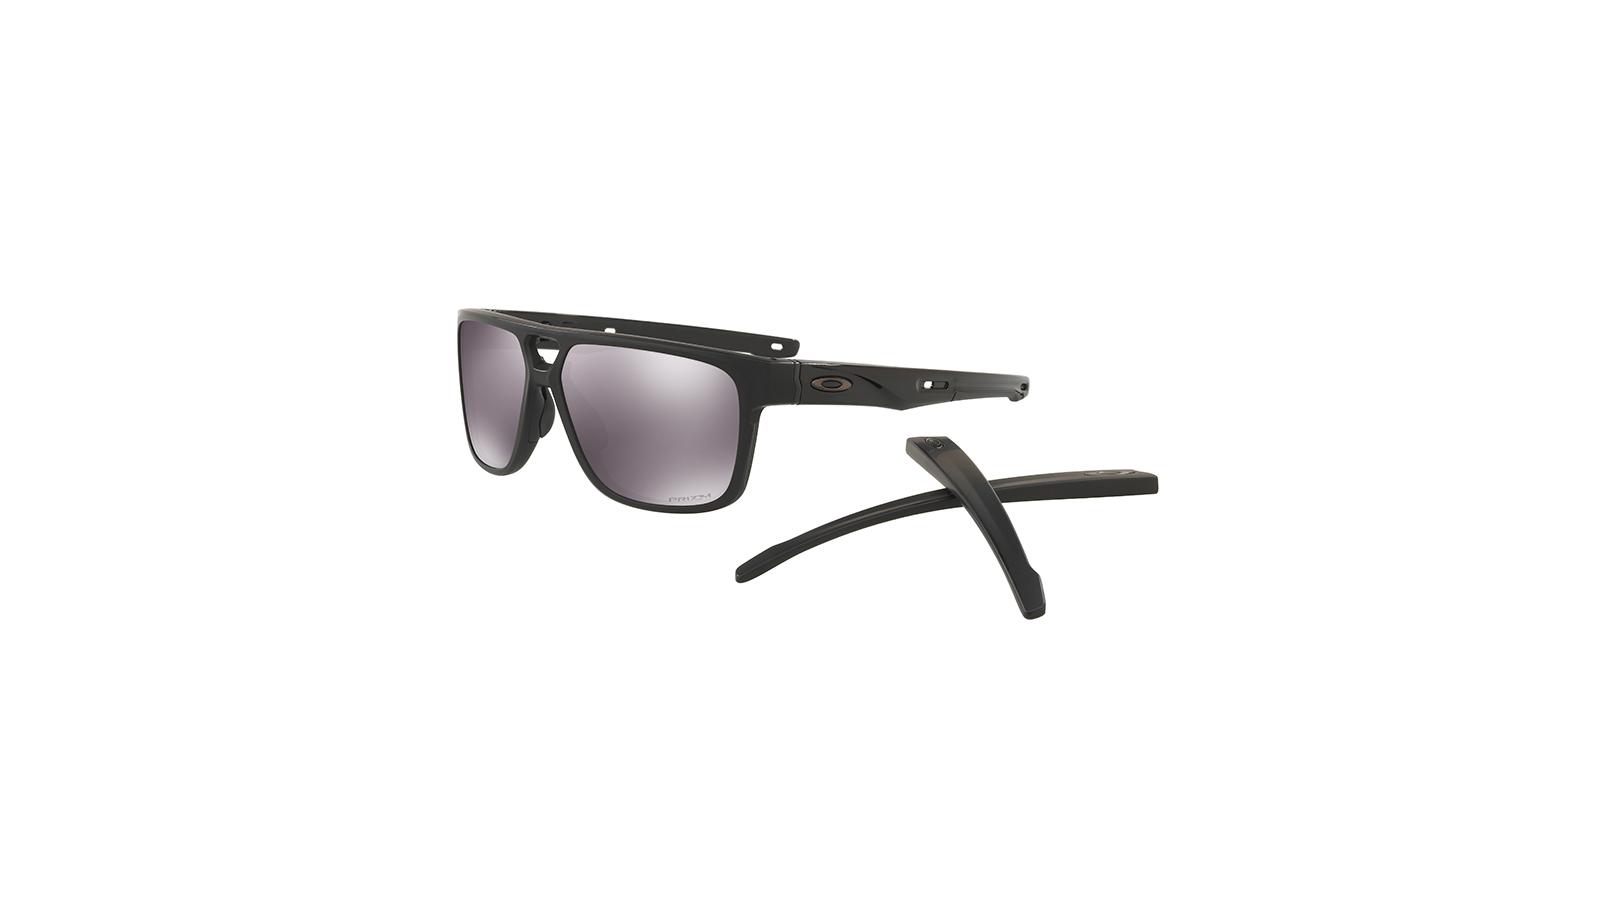 bd6a2be923a79 Oakley 2018 Sunglasses Preview - Boardsport SOURCE